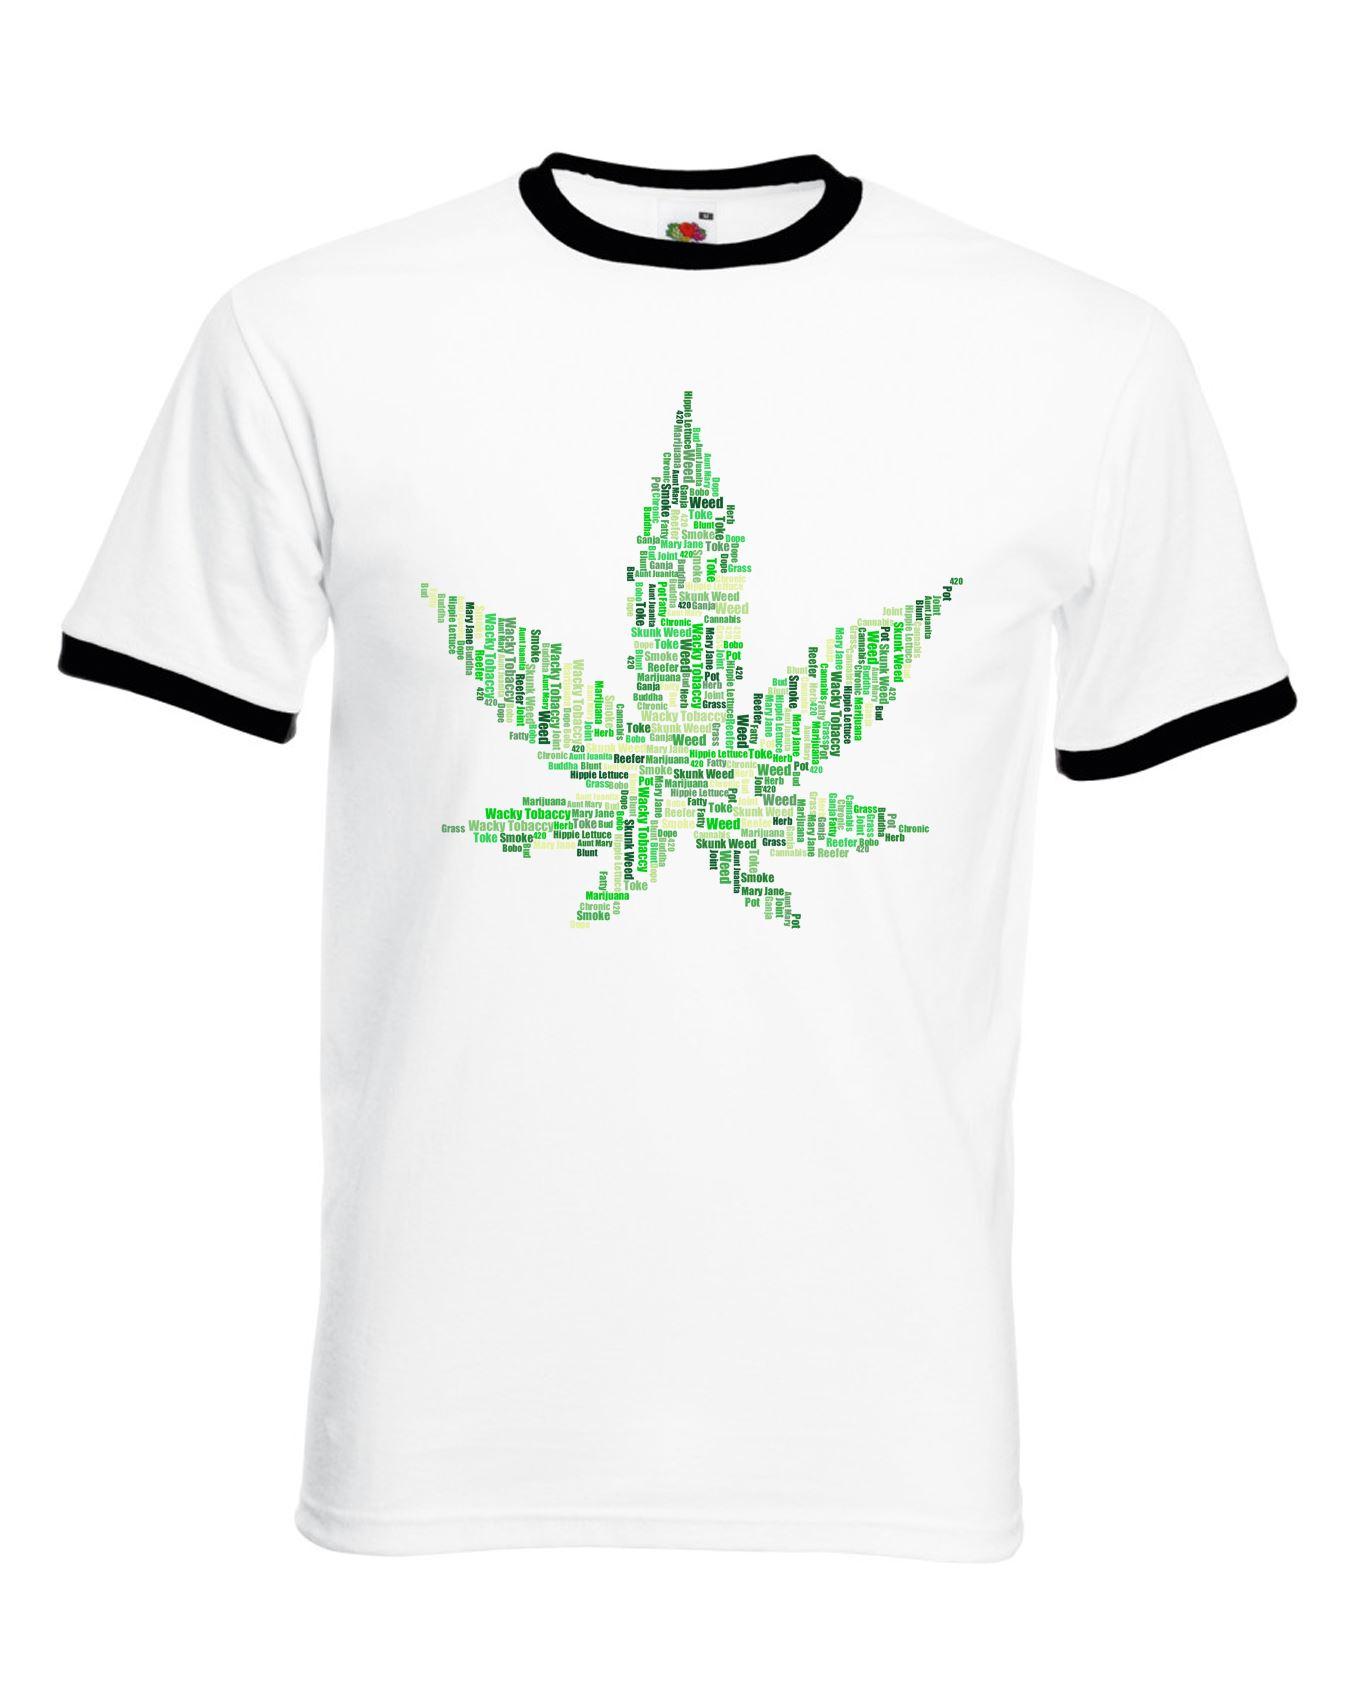 Big men/'s t-shirt 420 pot leaf cannabis weed decal graphic tall tee 5X 6X 7X 10X